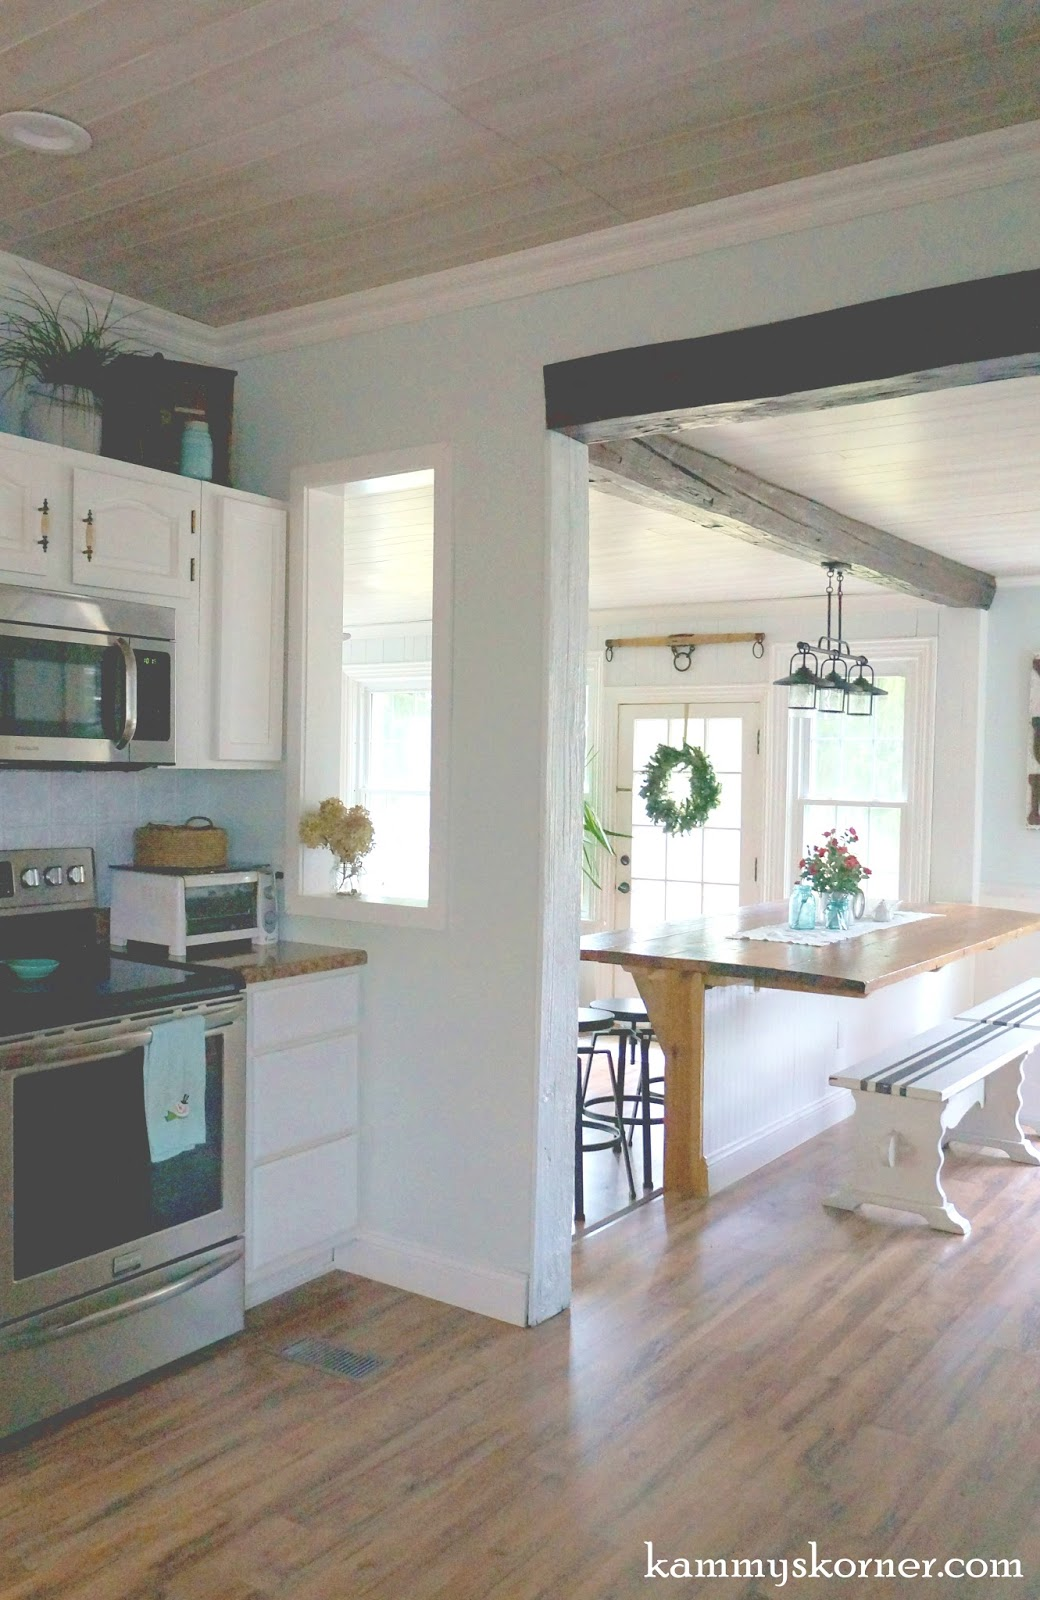 Pass Through Kitchen Window Serving Cart Kammy 39s Korner Make Your Home More Open Cut An Indoor